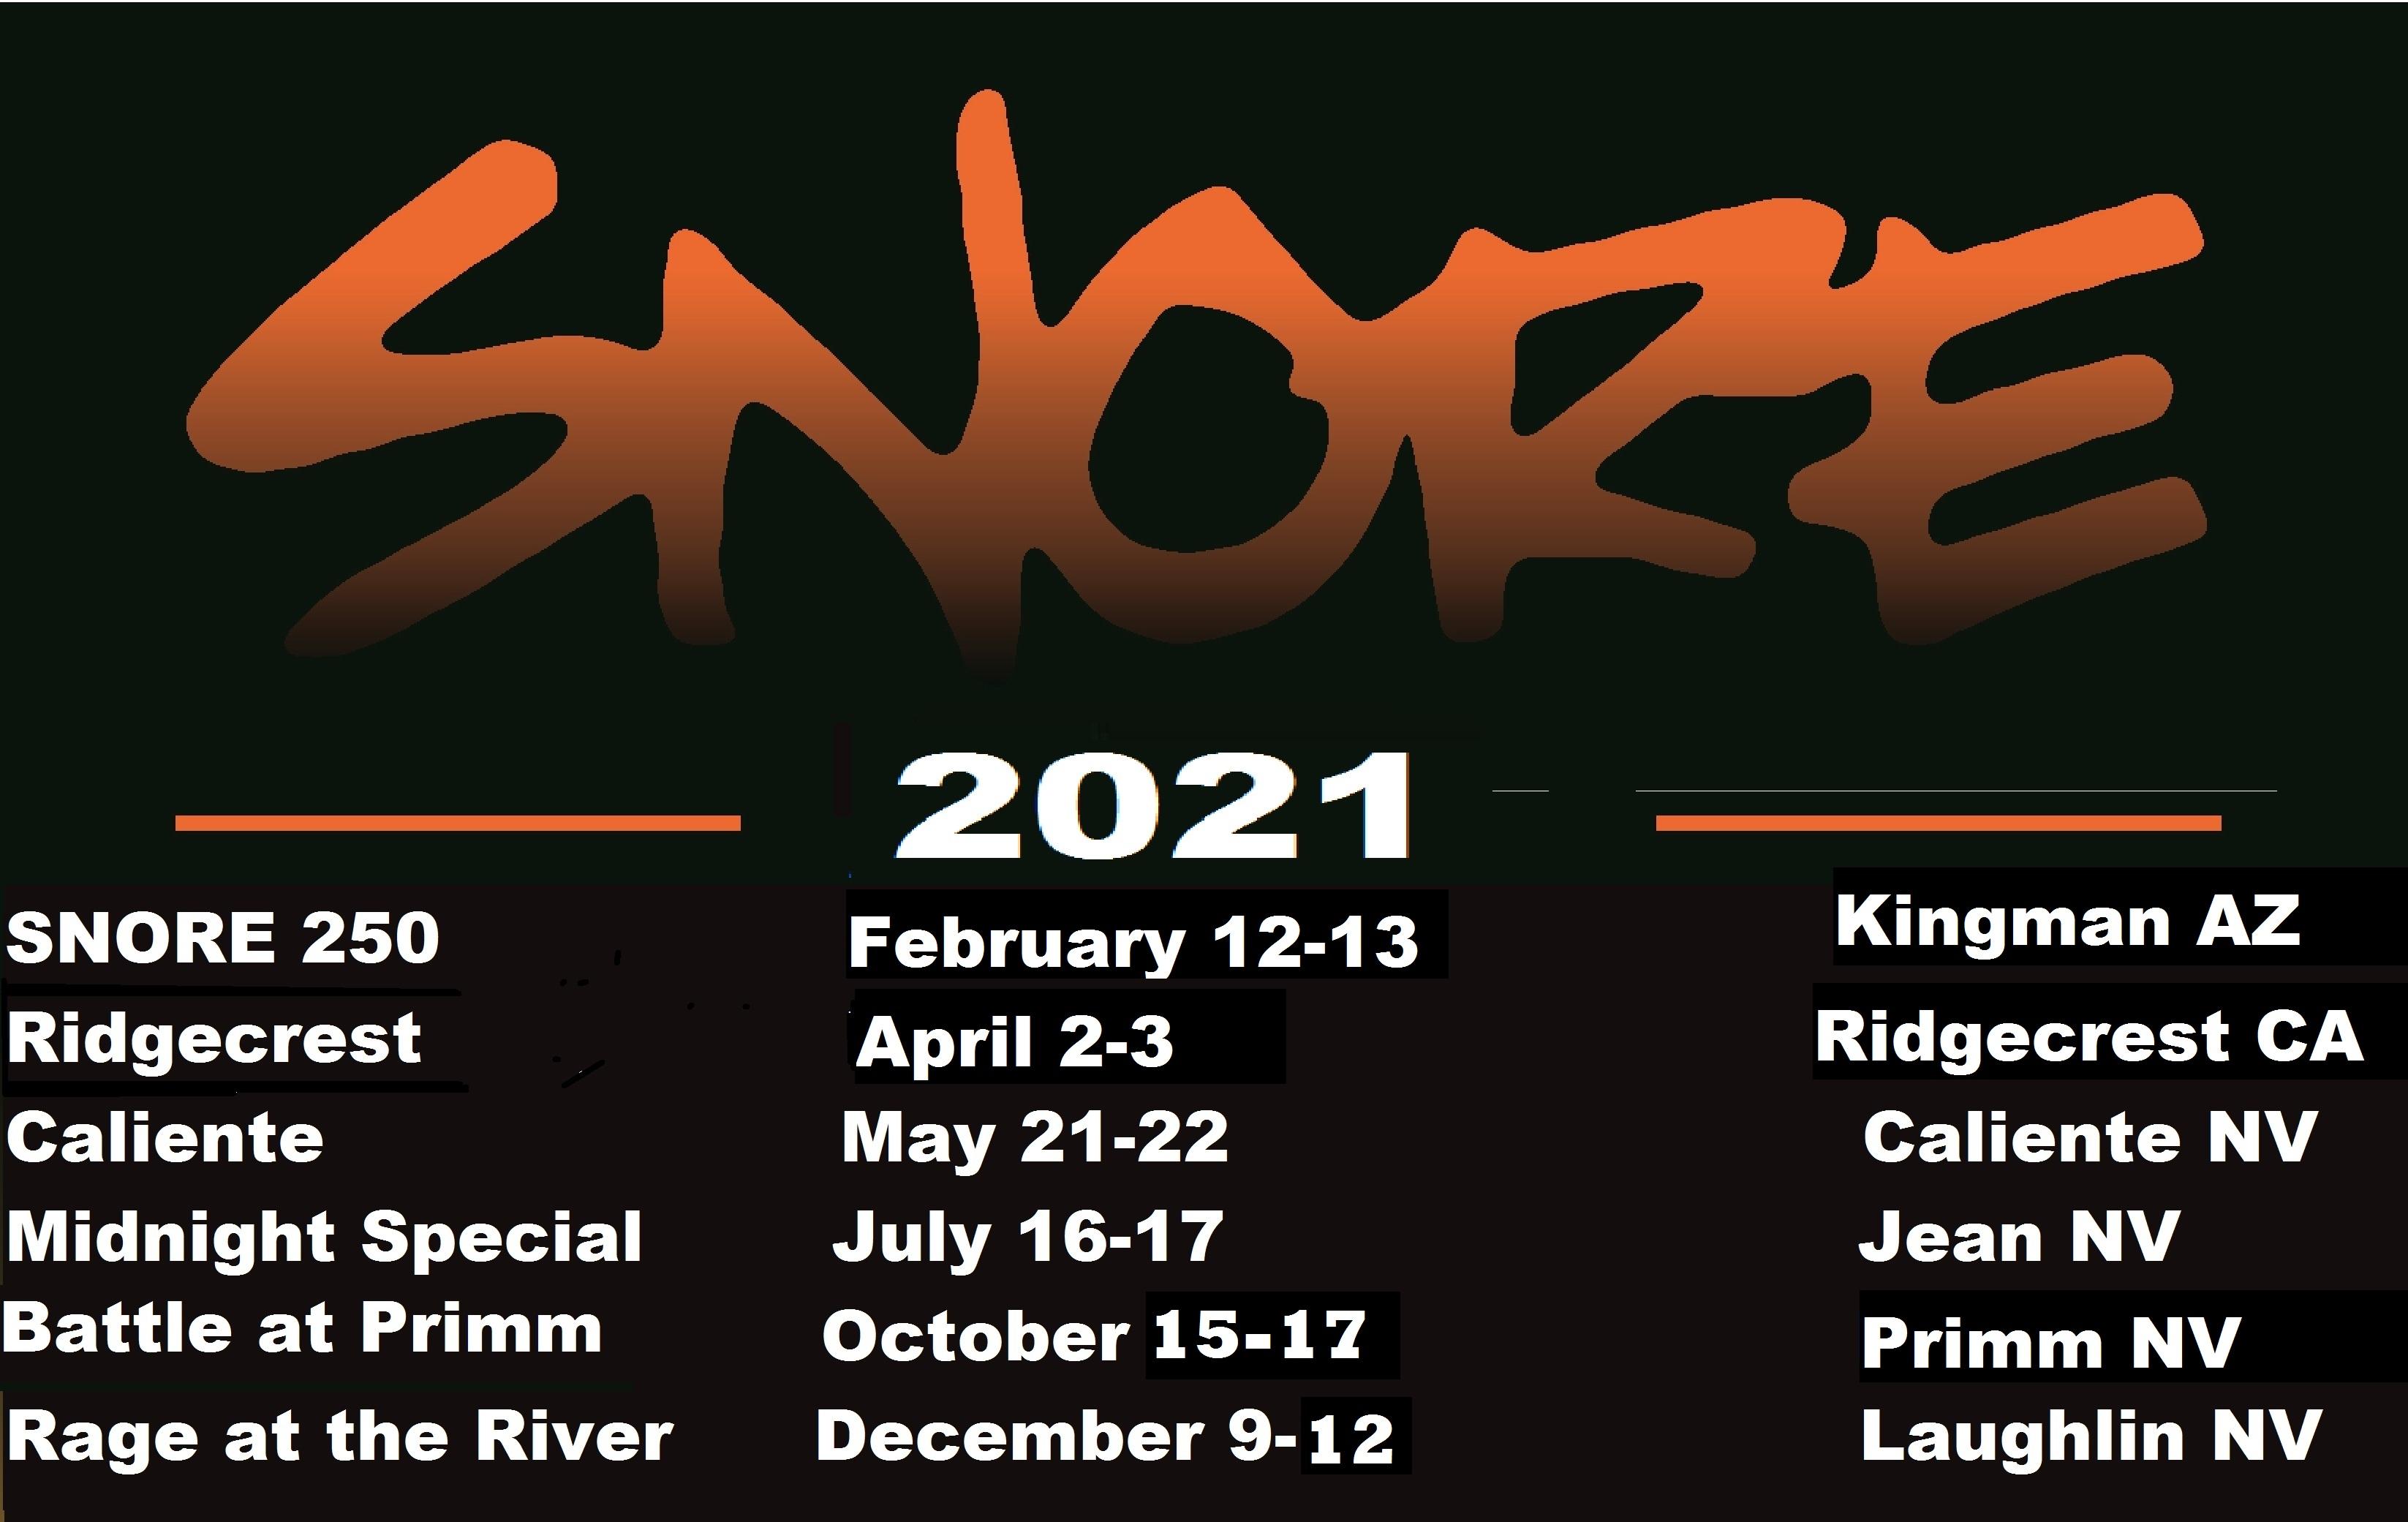 2021 snore new.jpg